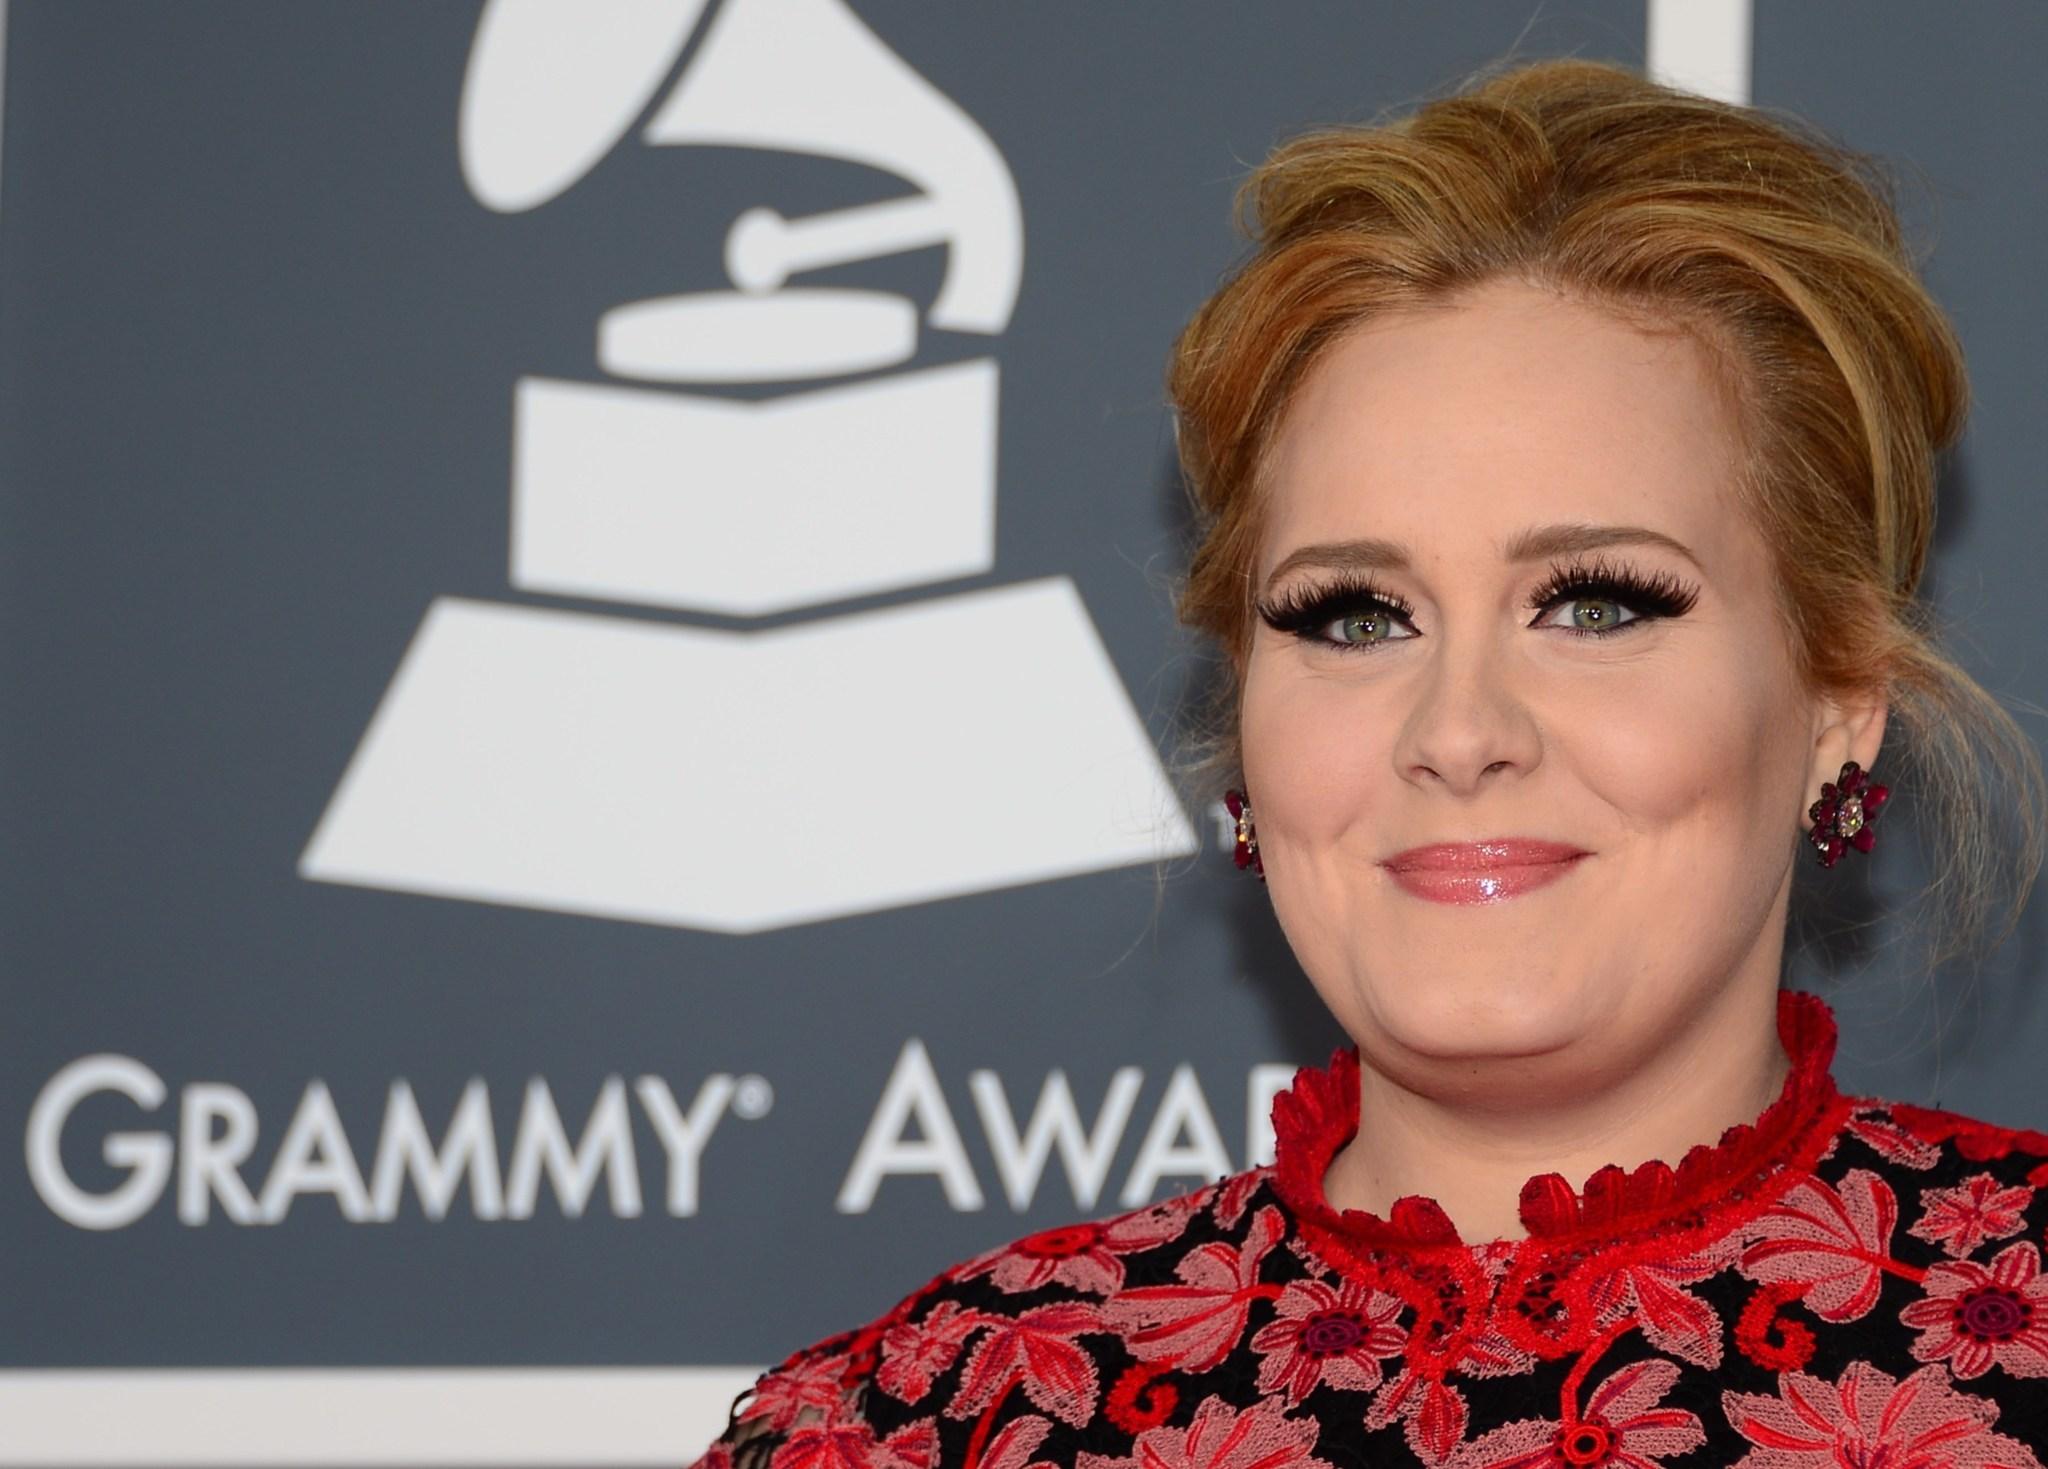 Adele To Release New Album Called '25' On Nov. 20